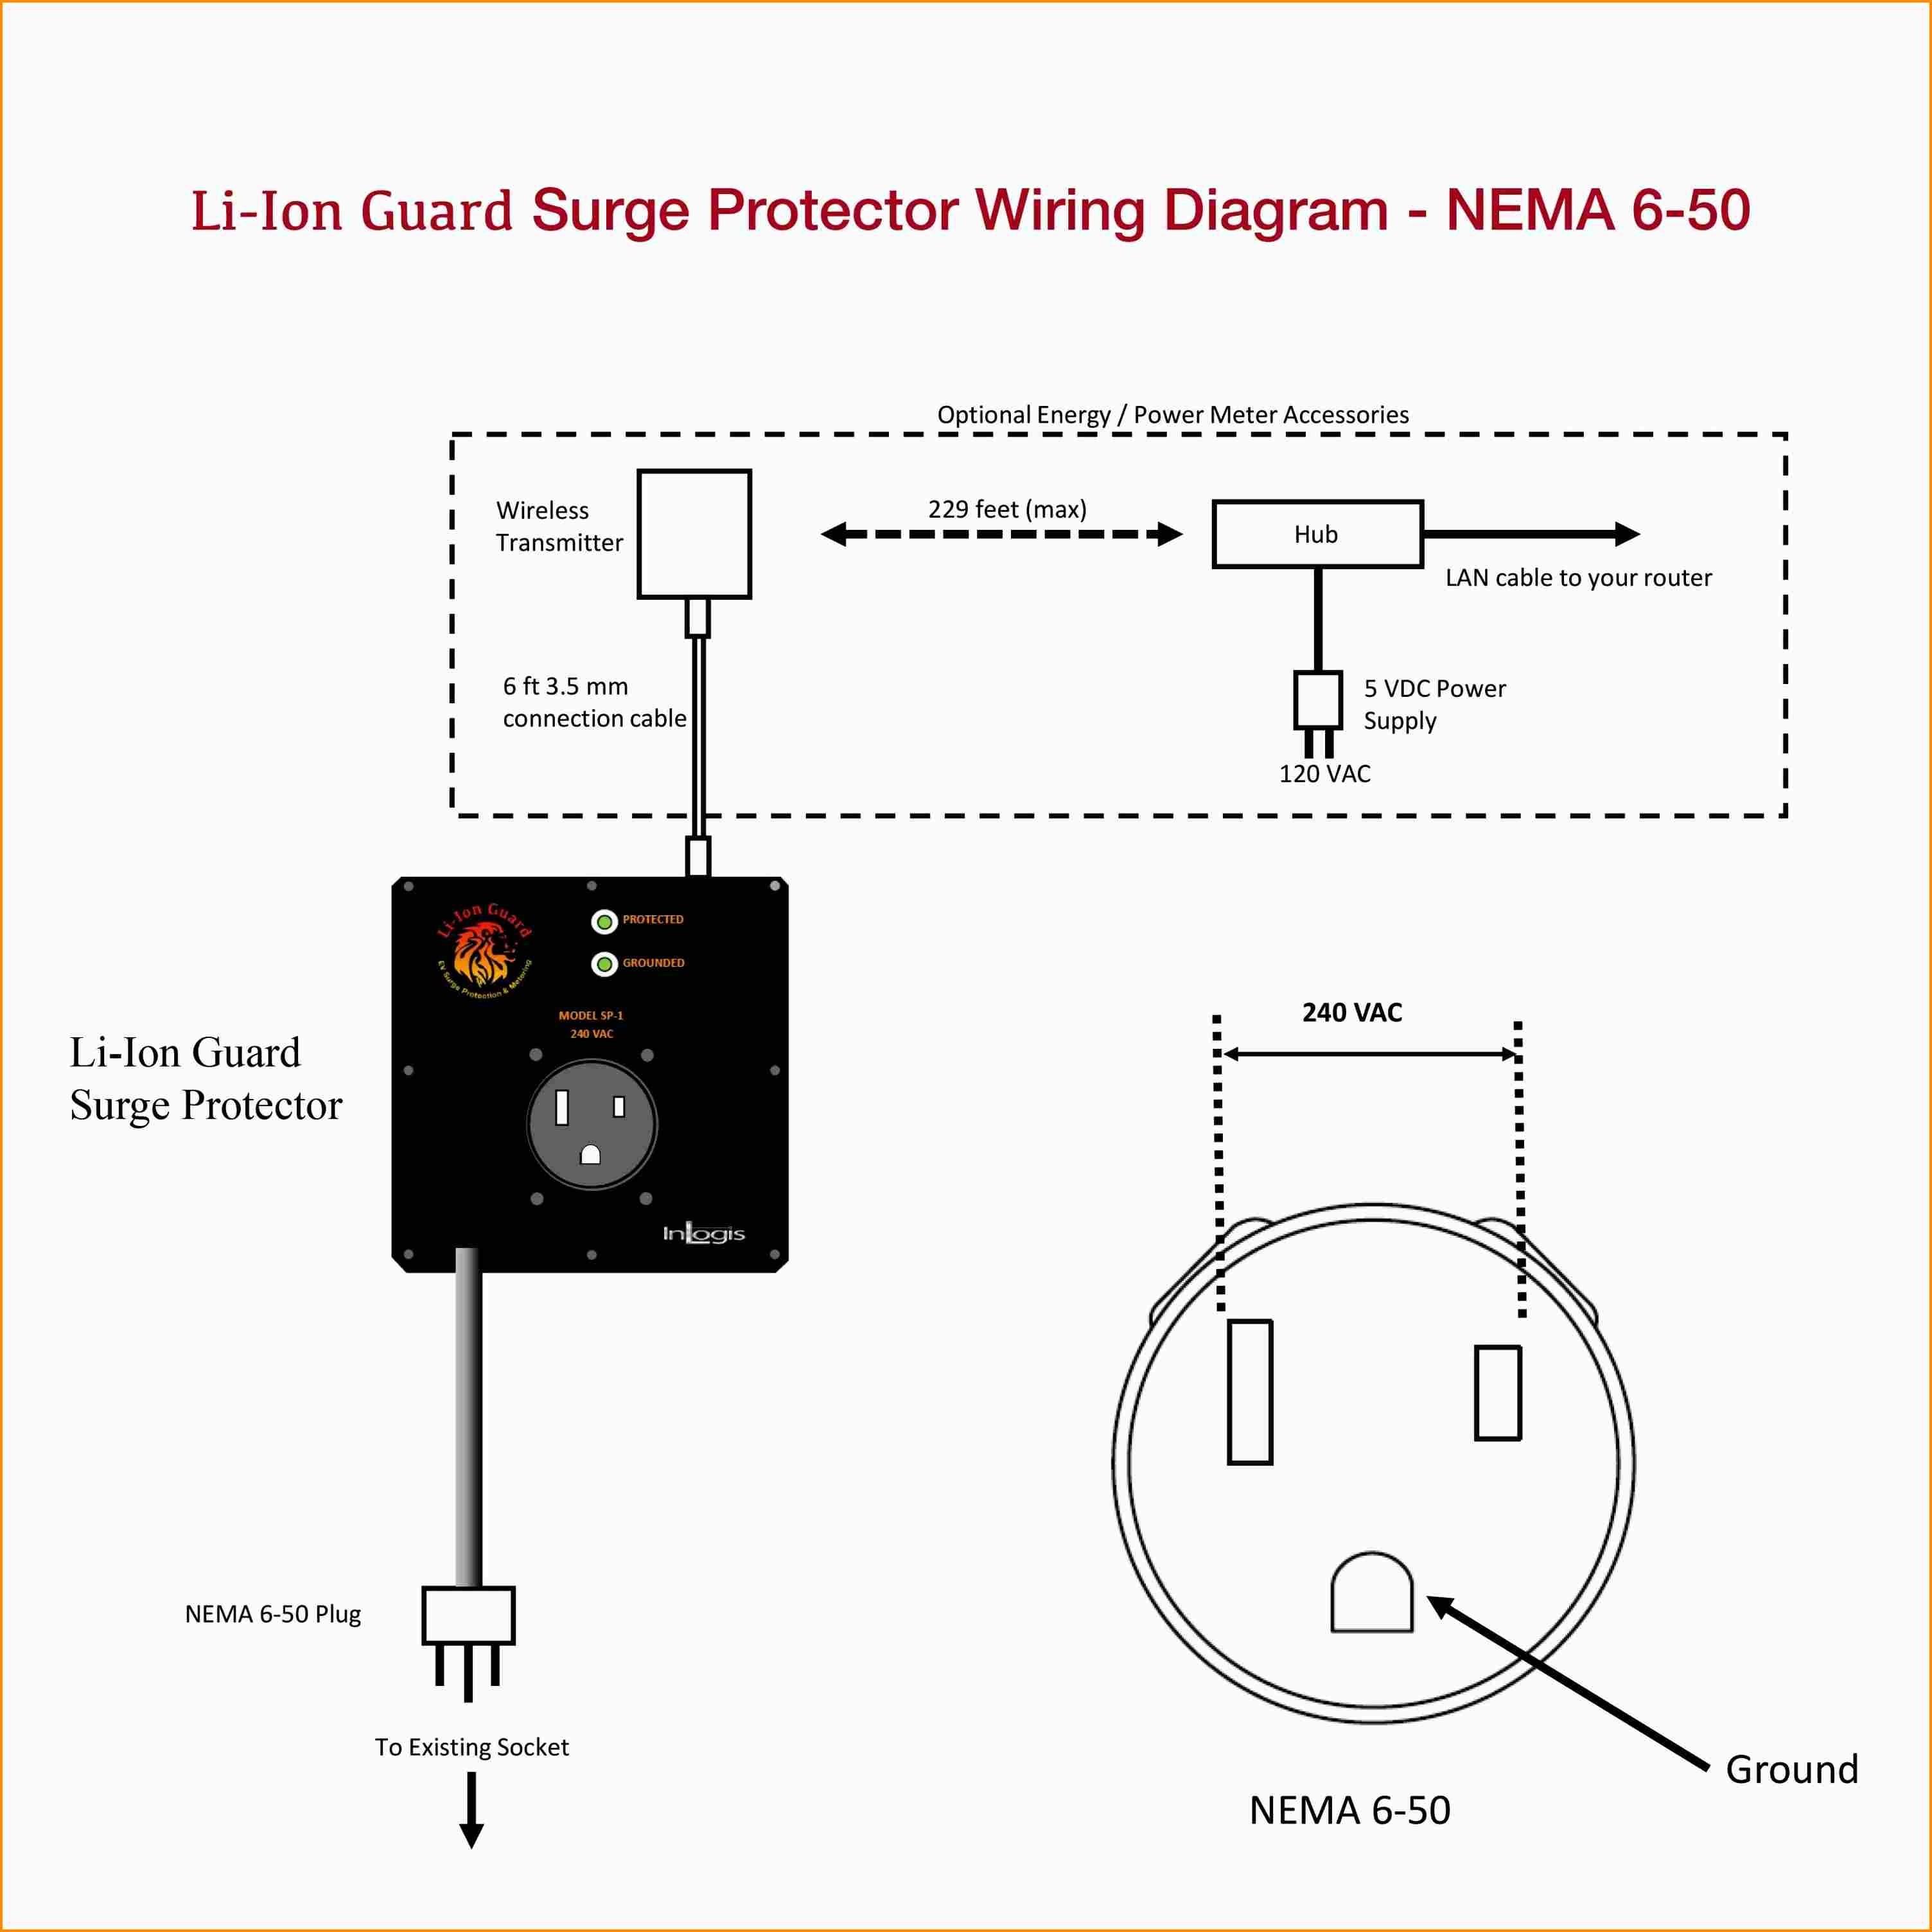 4 Prong Twist Lock Plug Wiring Diagram Luxury 7 30 Amp Twist Lock Plug Wiring Diagram